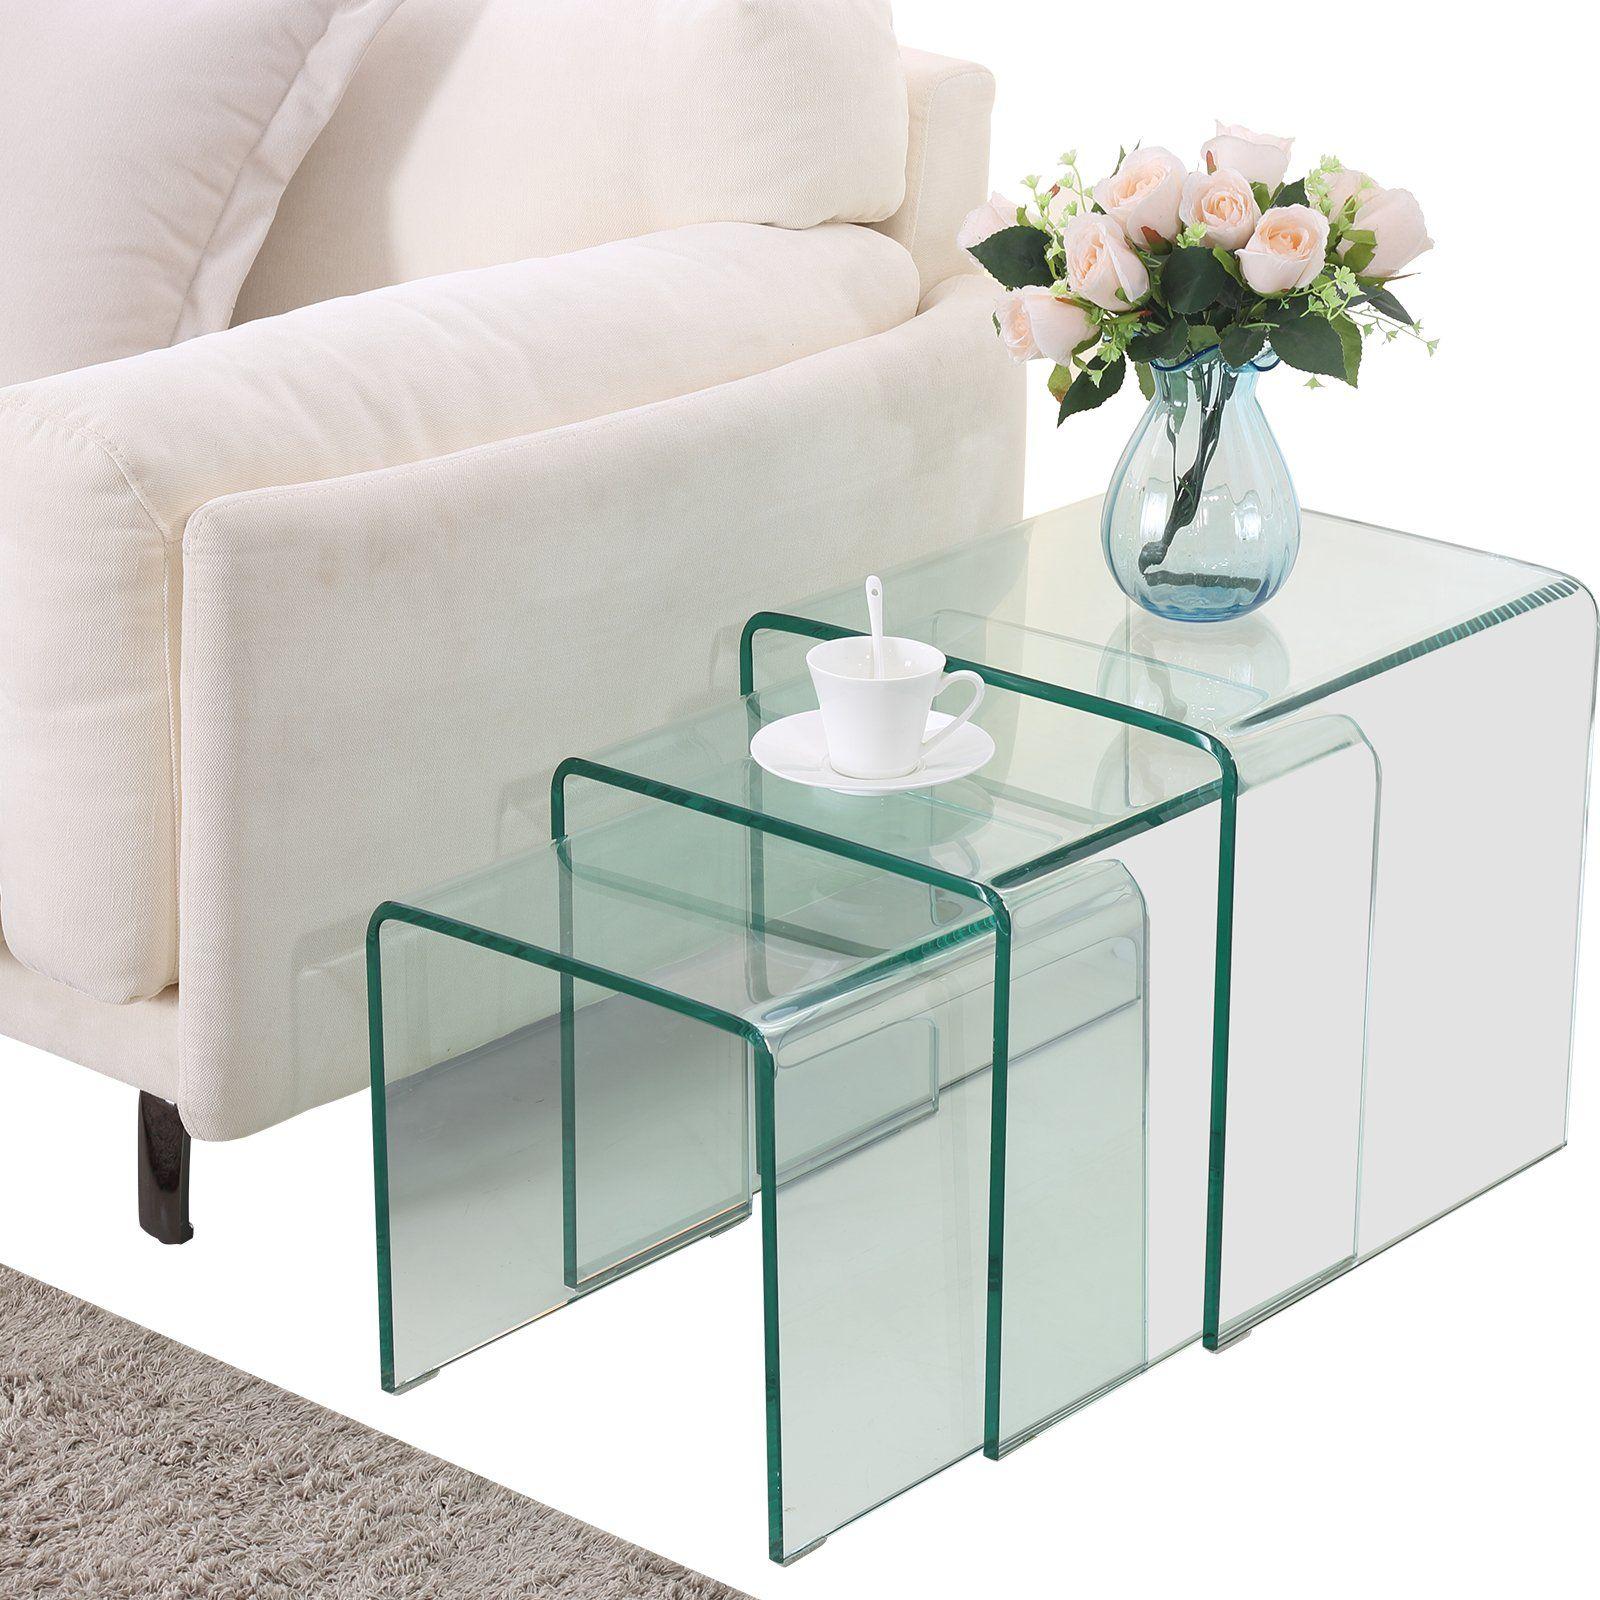 Devaro Acrylic And Glass Coffee Table Acrylic Coffee Table Coffee Table Glass Coffee Table [ 1200 x 1312 Pixel ]